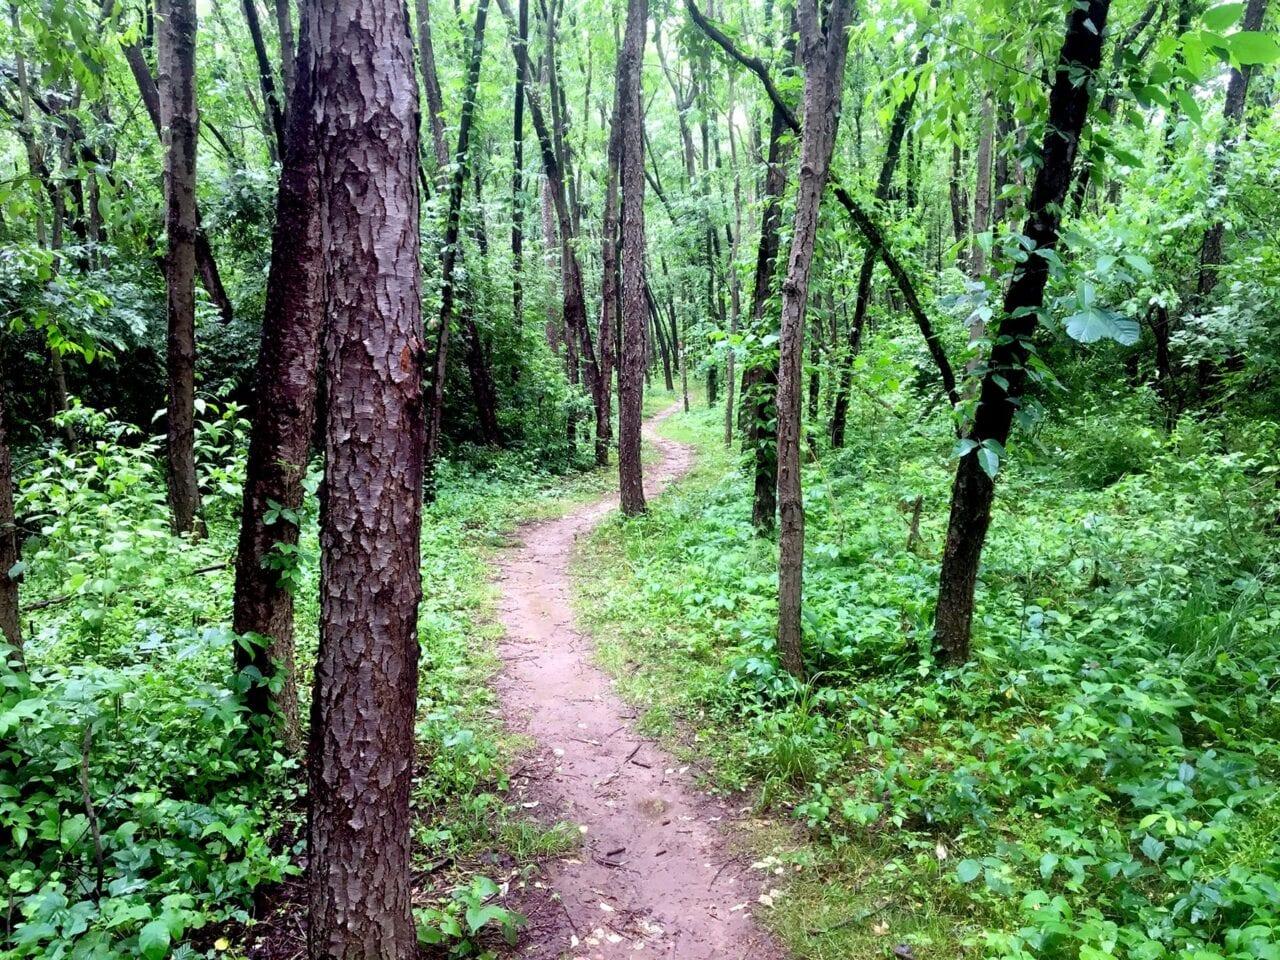 Appalachian Trail Hiking Guide - Guthook Guides